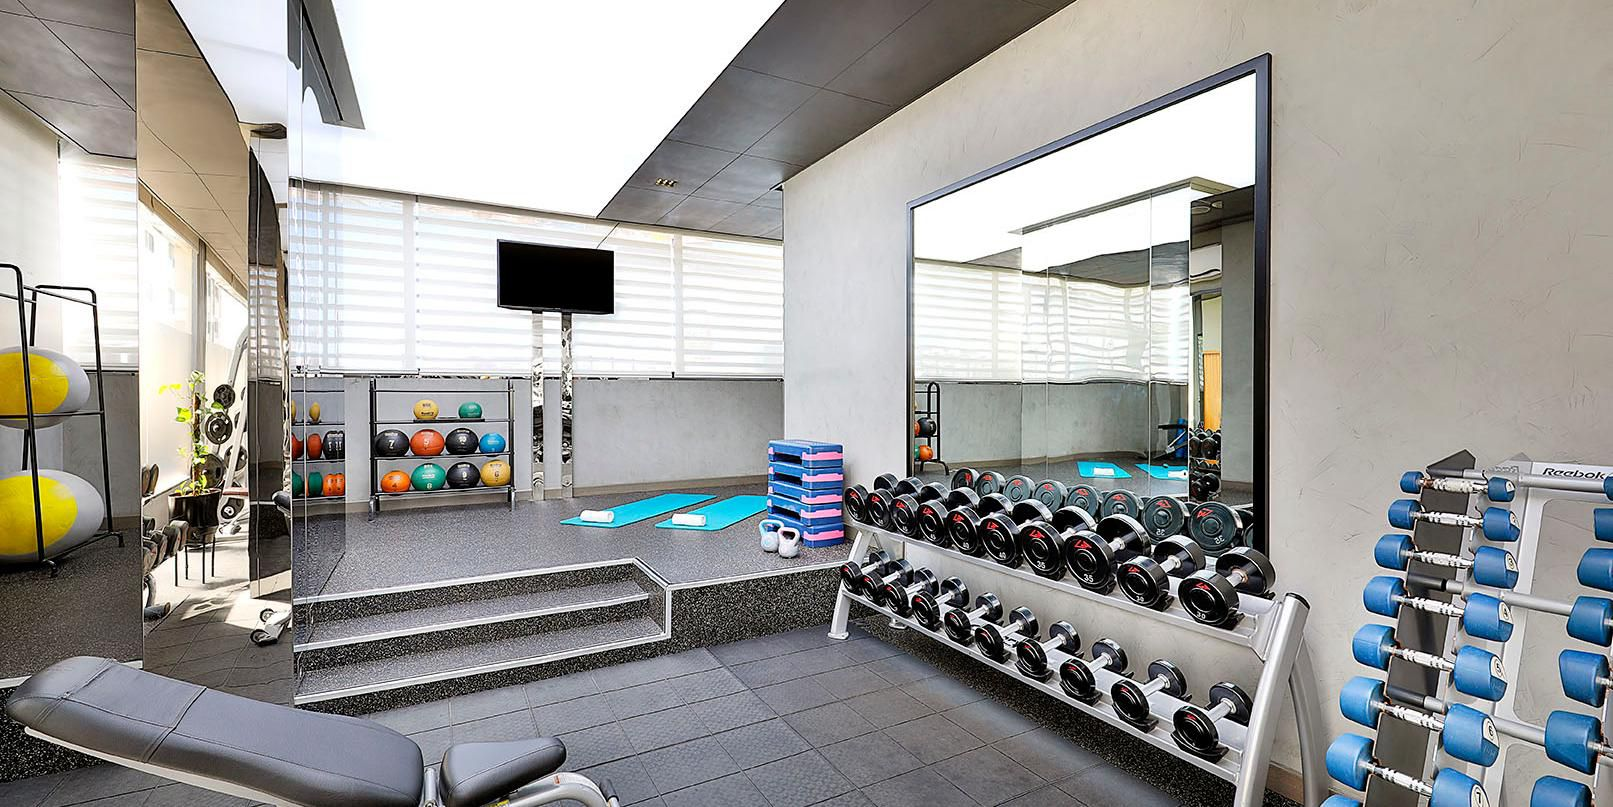 Fully equipped gym, voco Dubai, Sheikh Zayed Road, near DIFC